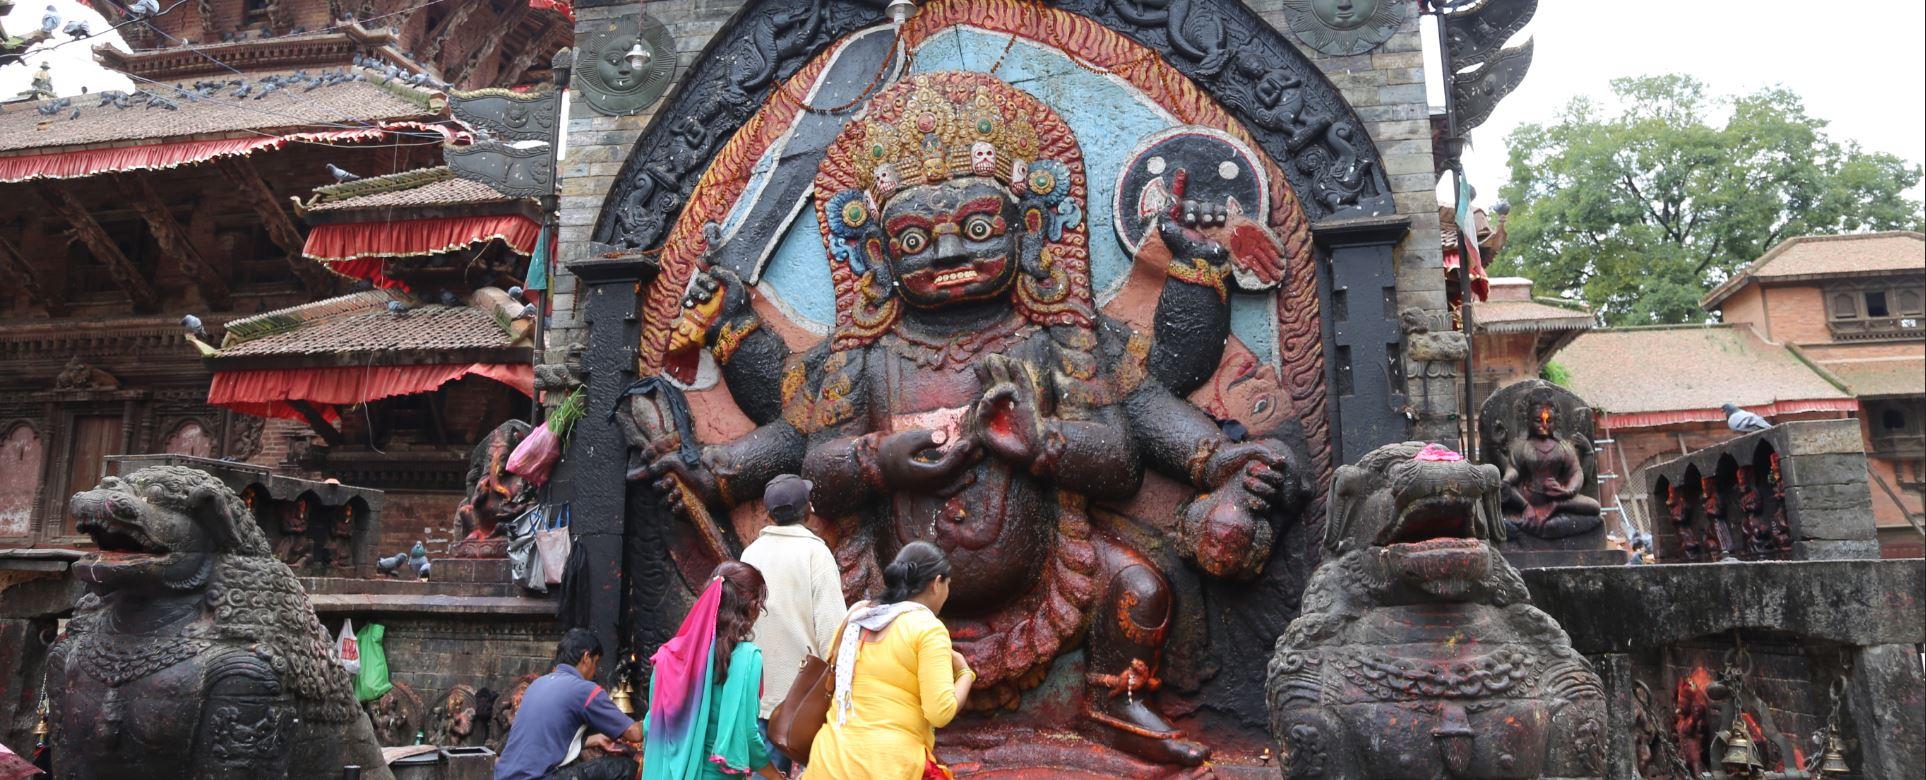 Kâlabhairava dieu